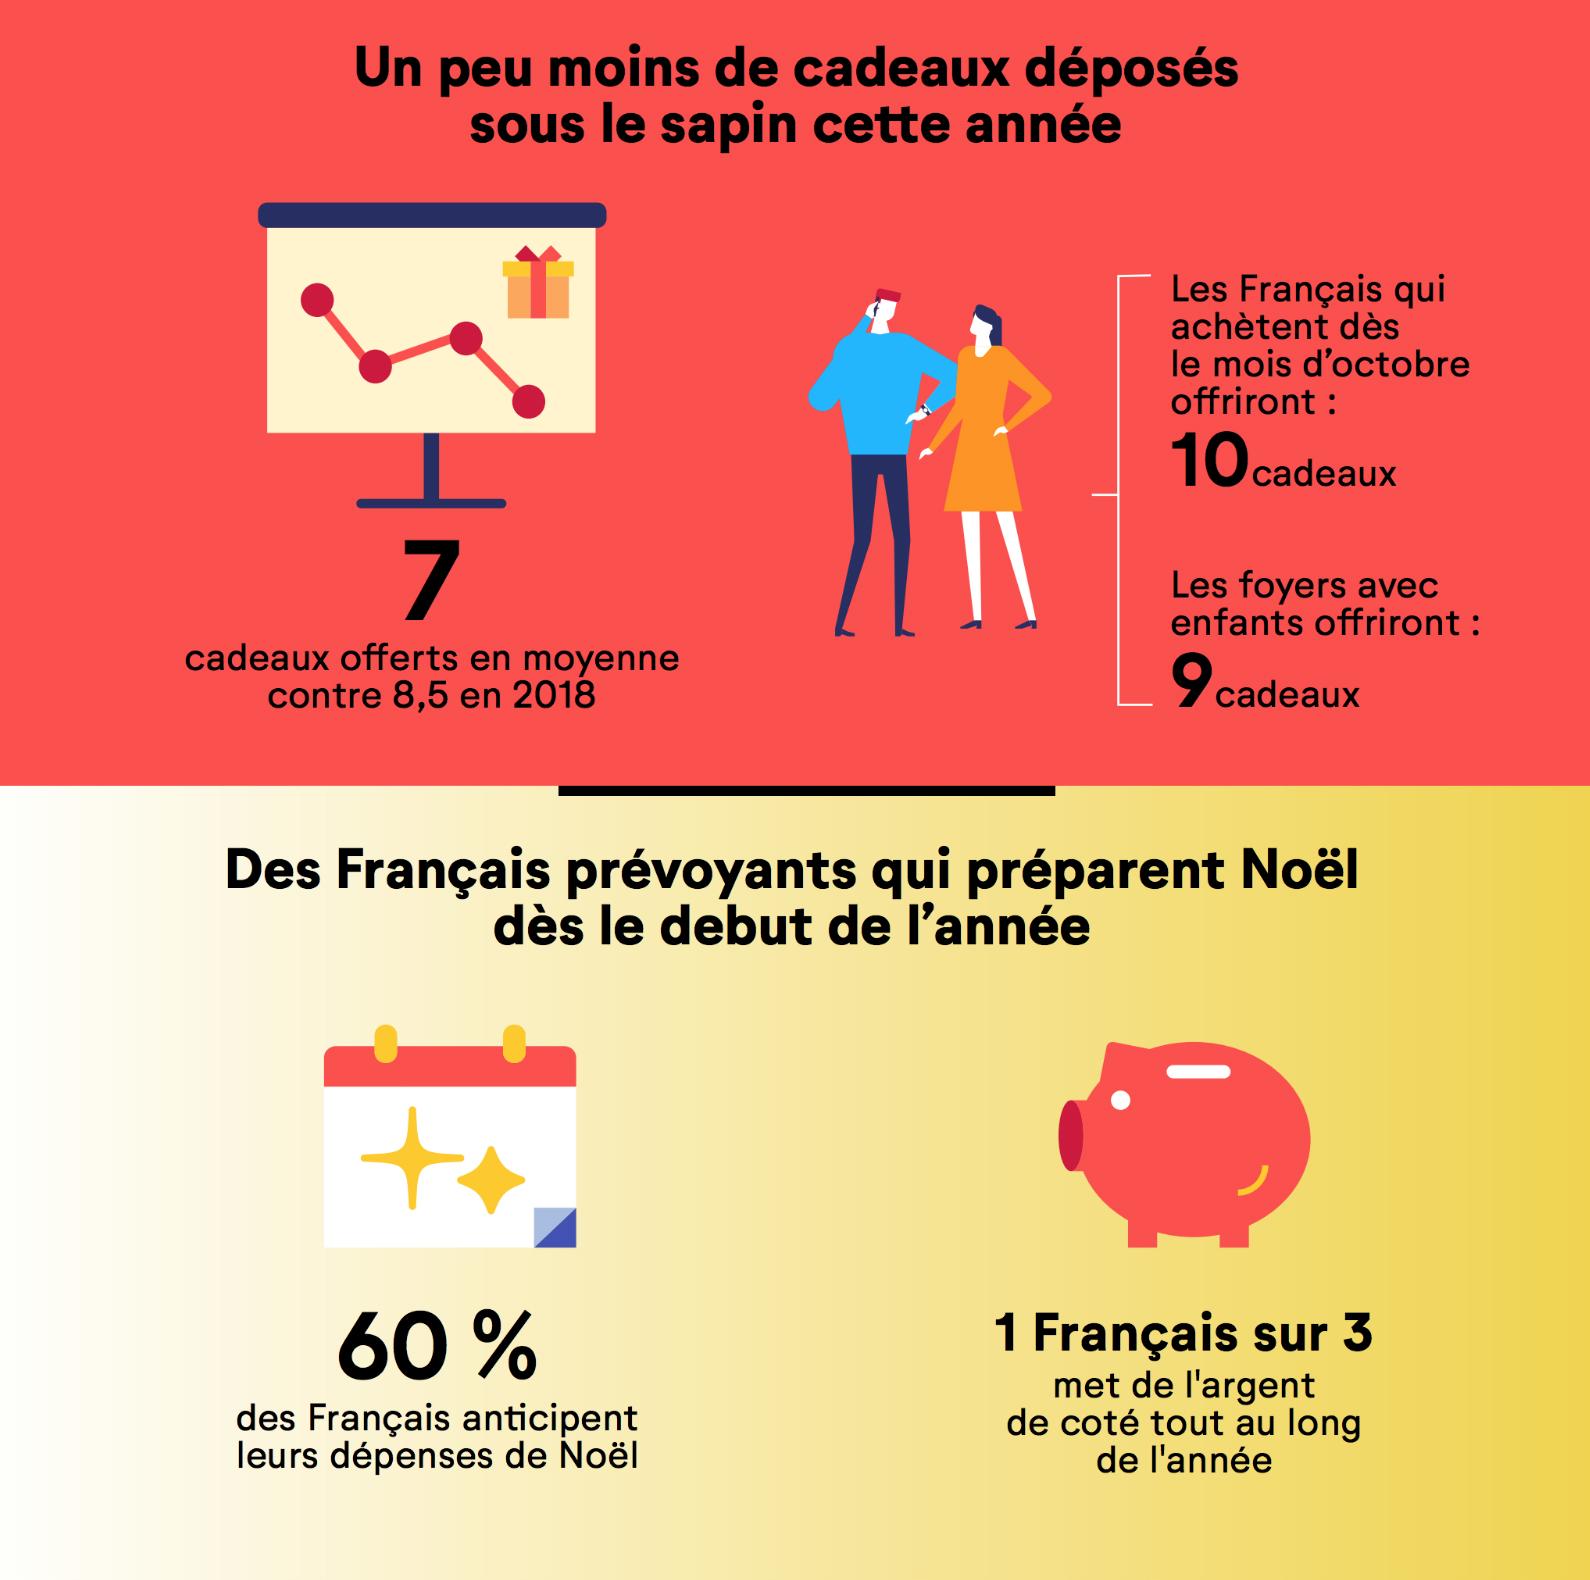 budget_noel_2019_previsions_cofidis_5ddd00a4bc1b0.jpg